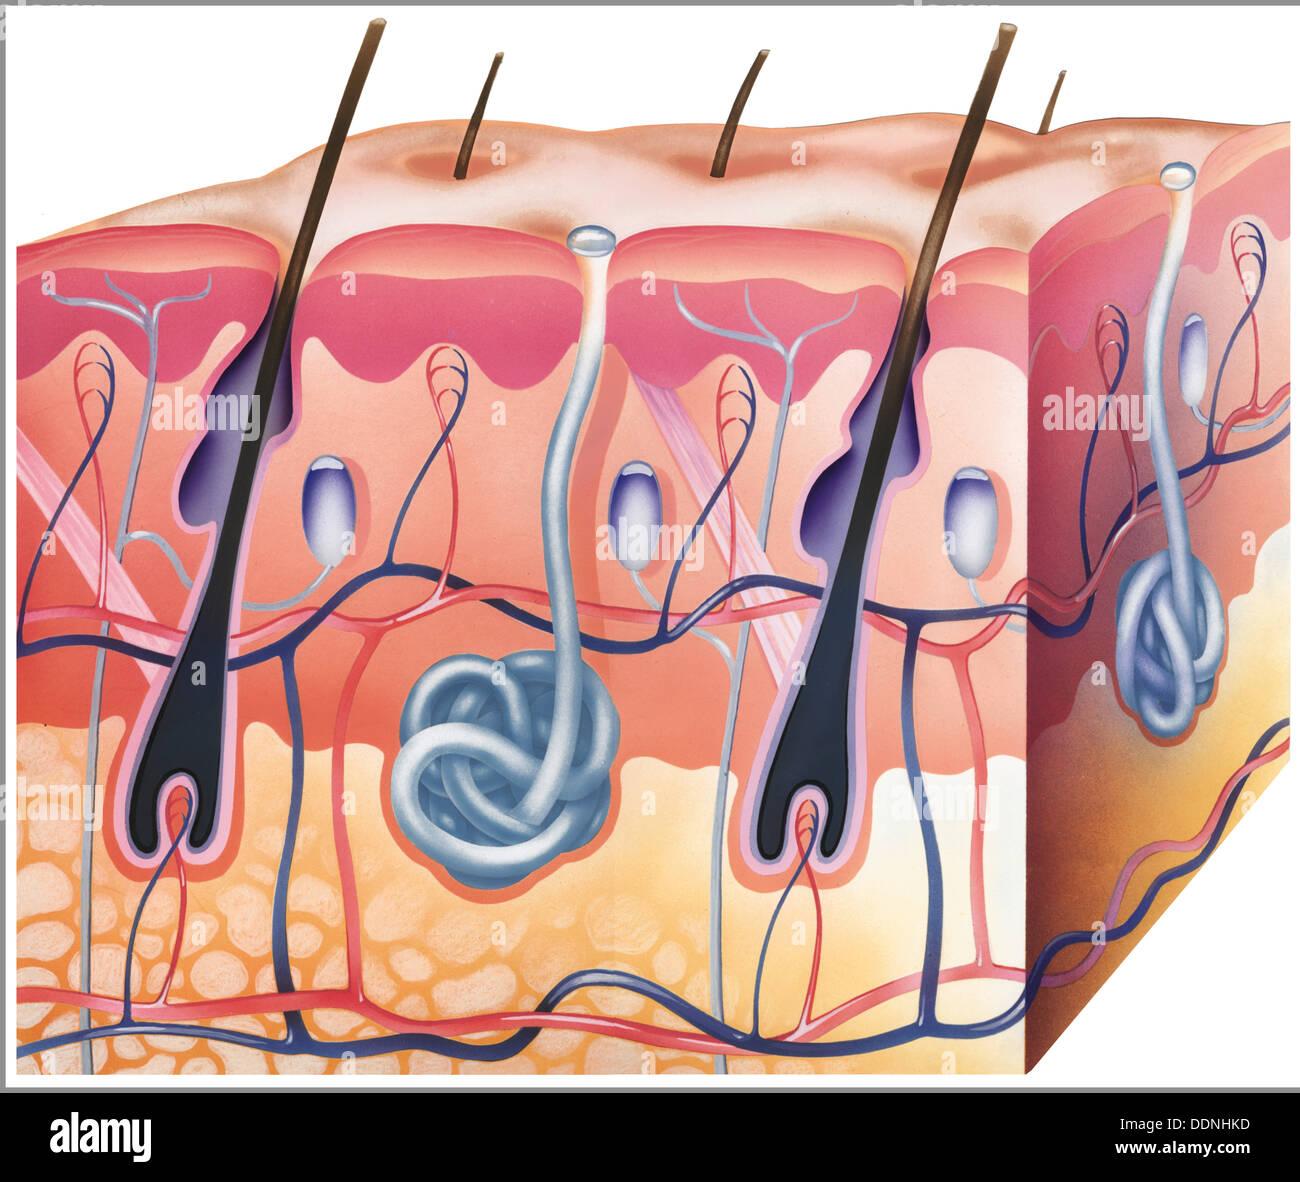 Human Skin Cross Section Stock Photos Amp Human Skin Cross